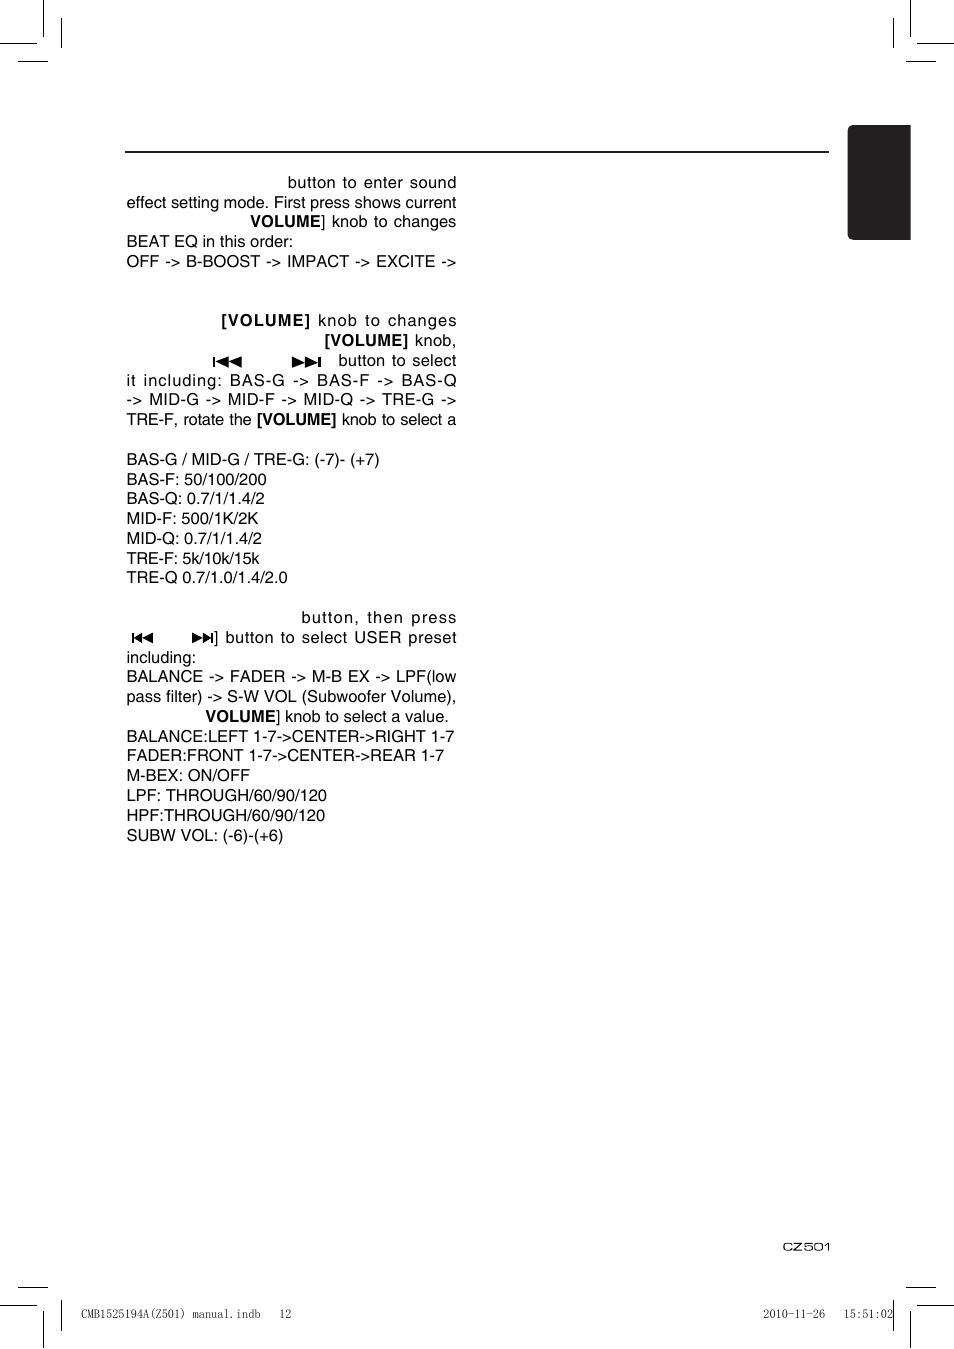 audio setup clarion cz501 user manual page 13 34 rh manualsdir com clarion cx501 user manual Clarion CX501